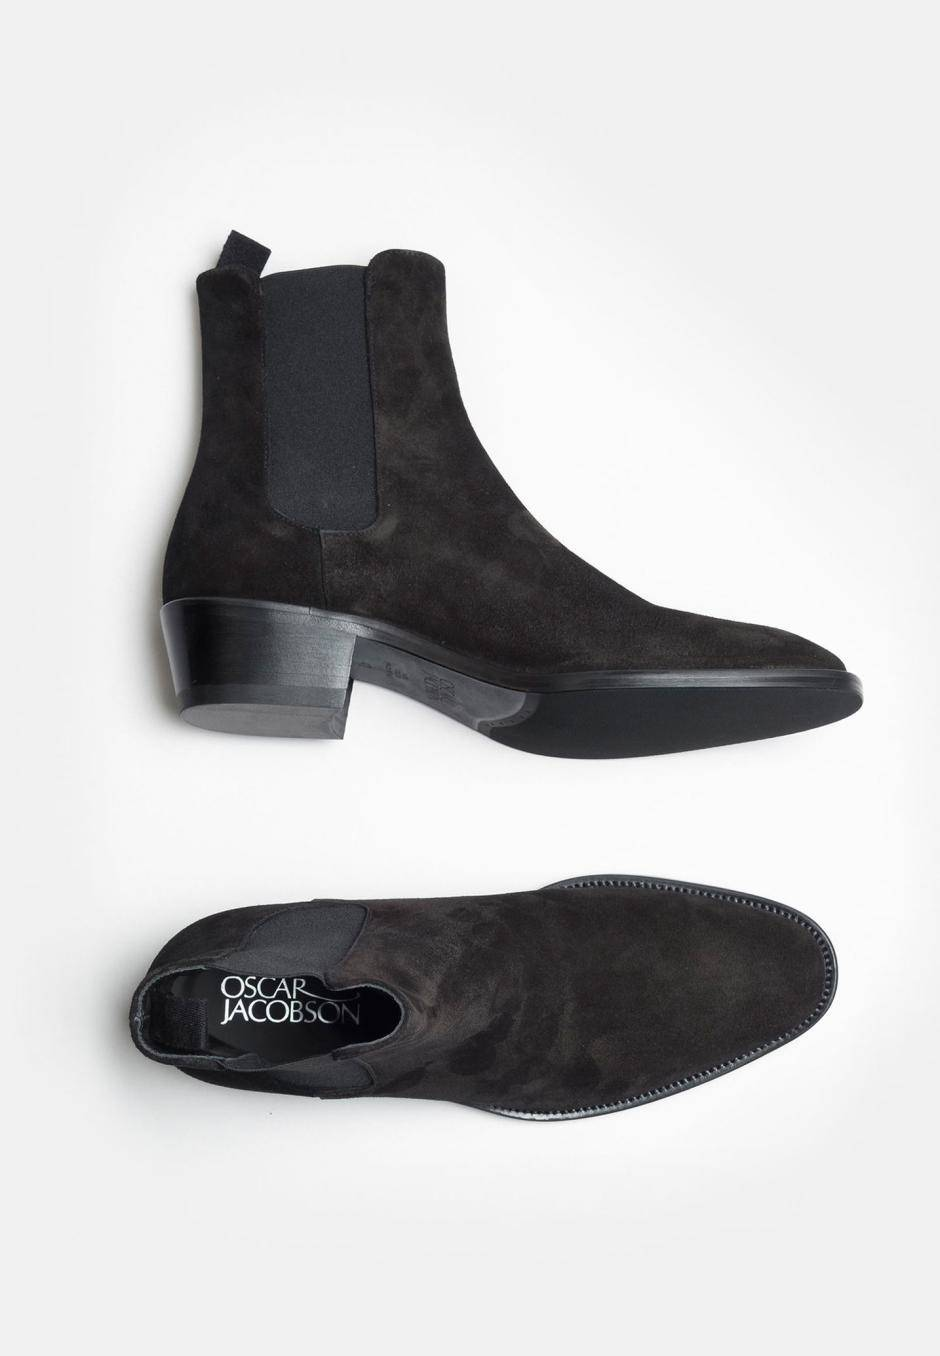 Oscar Jacobson Robin Boots